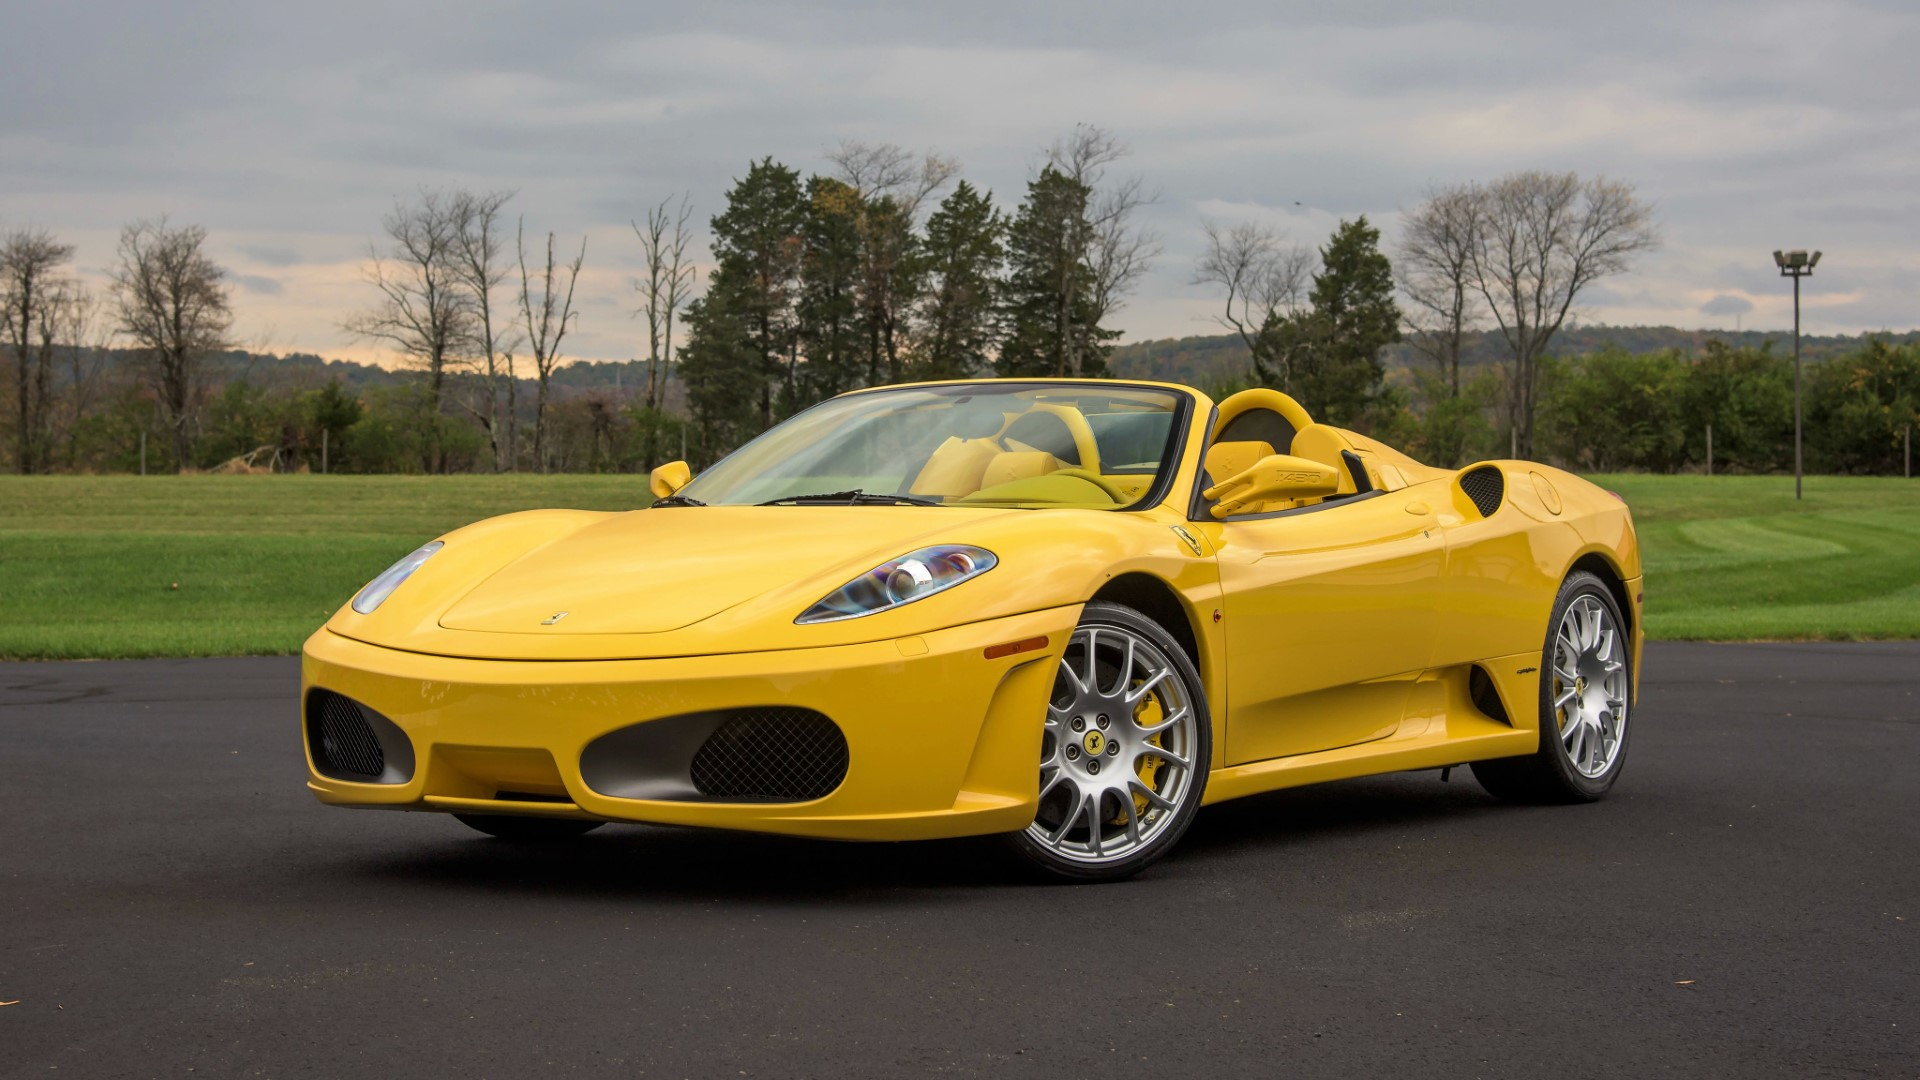 Carros de Lionel Messi: Ferrari F430 Spider